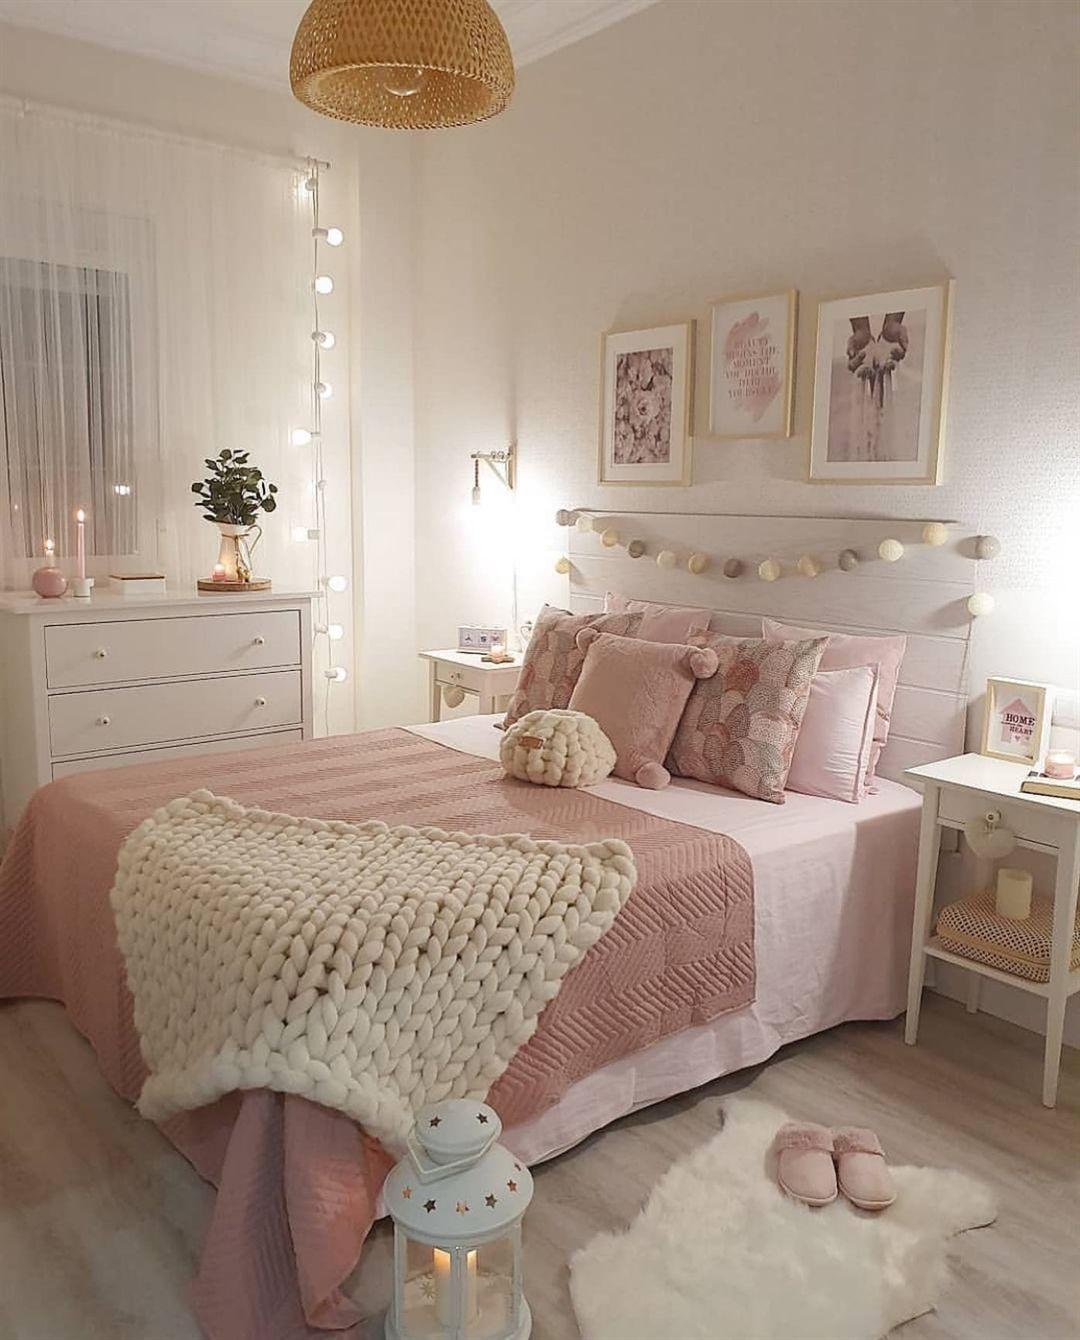 magnifique publication de @roomforgirl  #interiordecorator